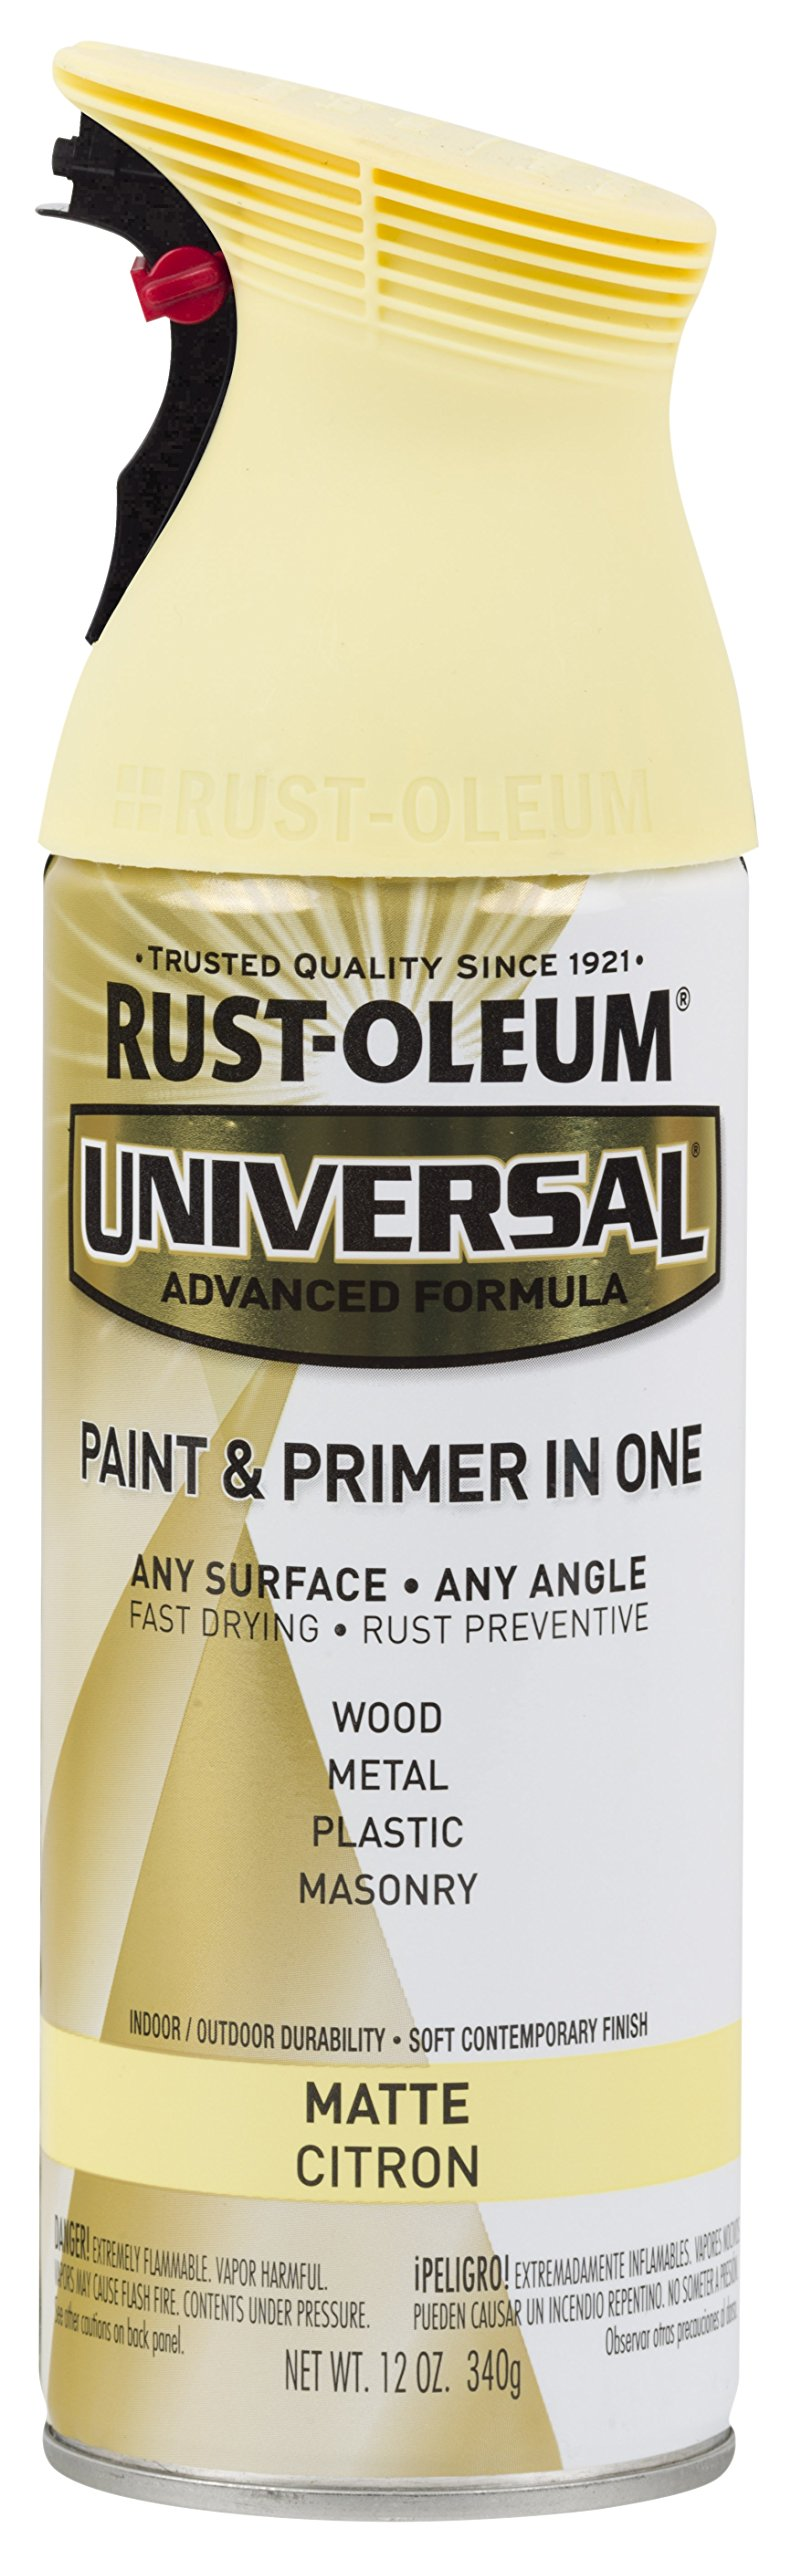 Rust-Oleum 282813-6PK Universal All Surface Spray Paint, 6 Pack, Matte Citron